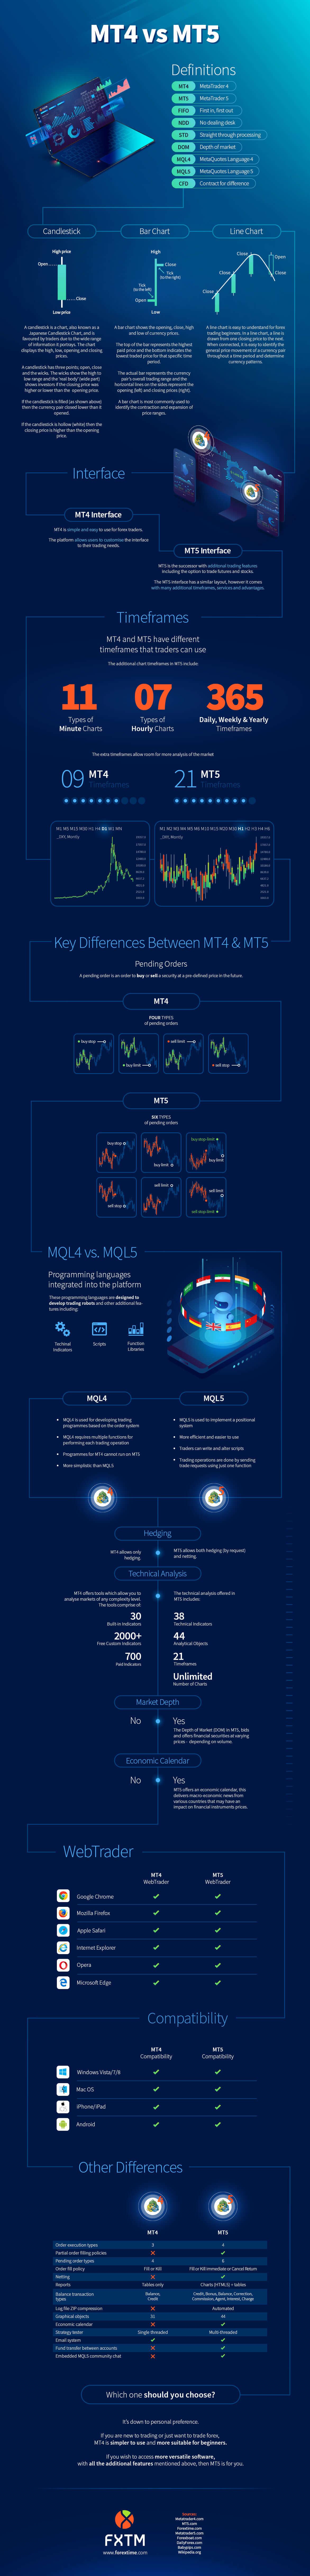 MT4 vs MT5 - Explained | FXTM Global